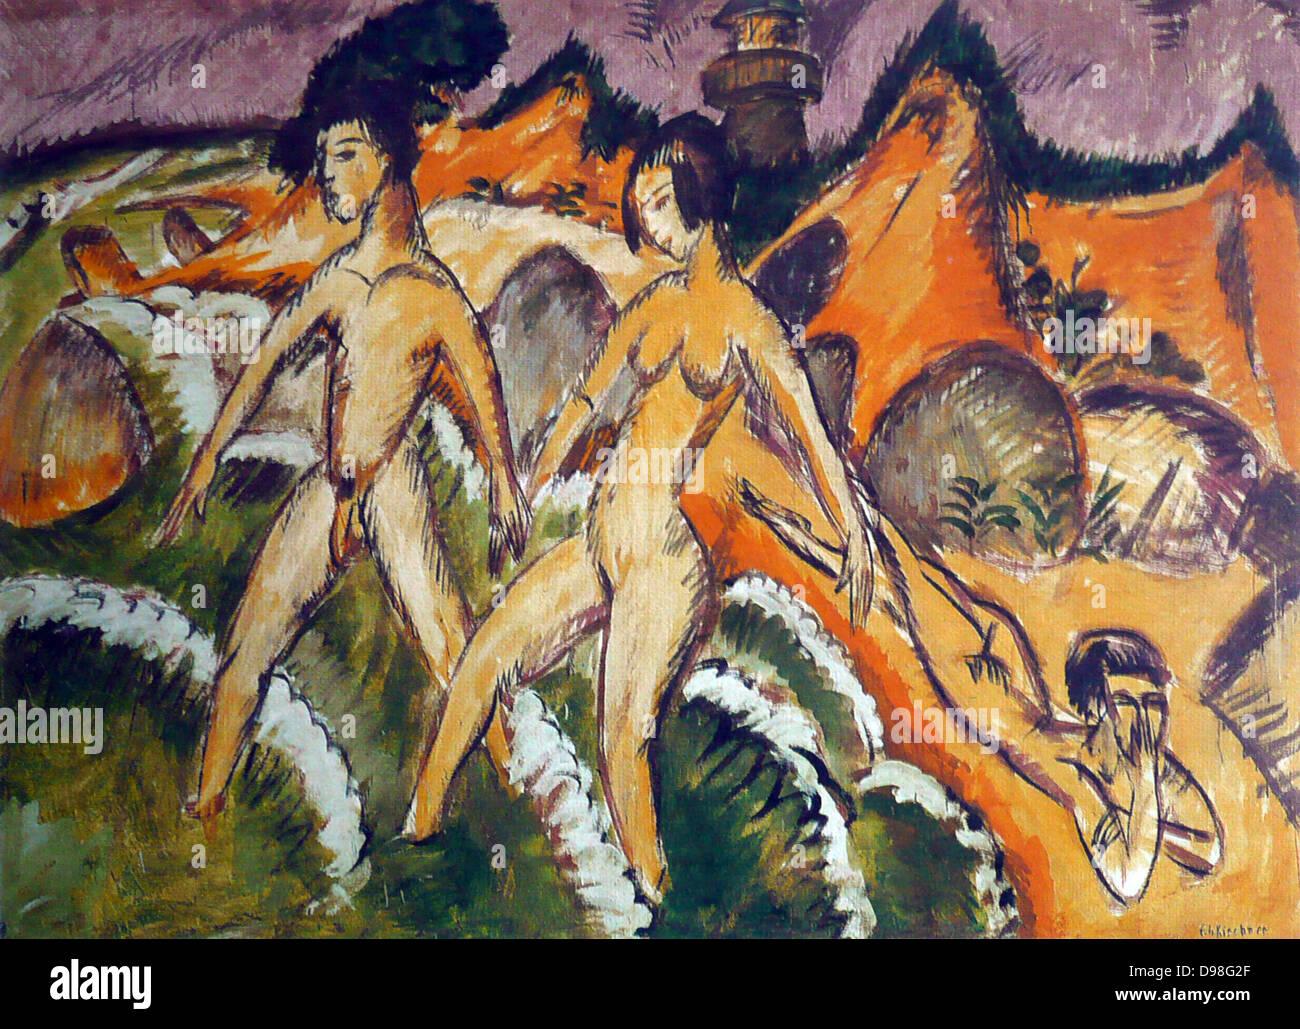 Ernst Ludwig Kirchner (6 May 1880 – 15 June 1938), German expressionist painter Personnes entrant dans la mer - Stock Image